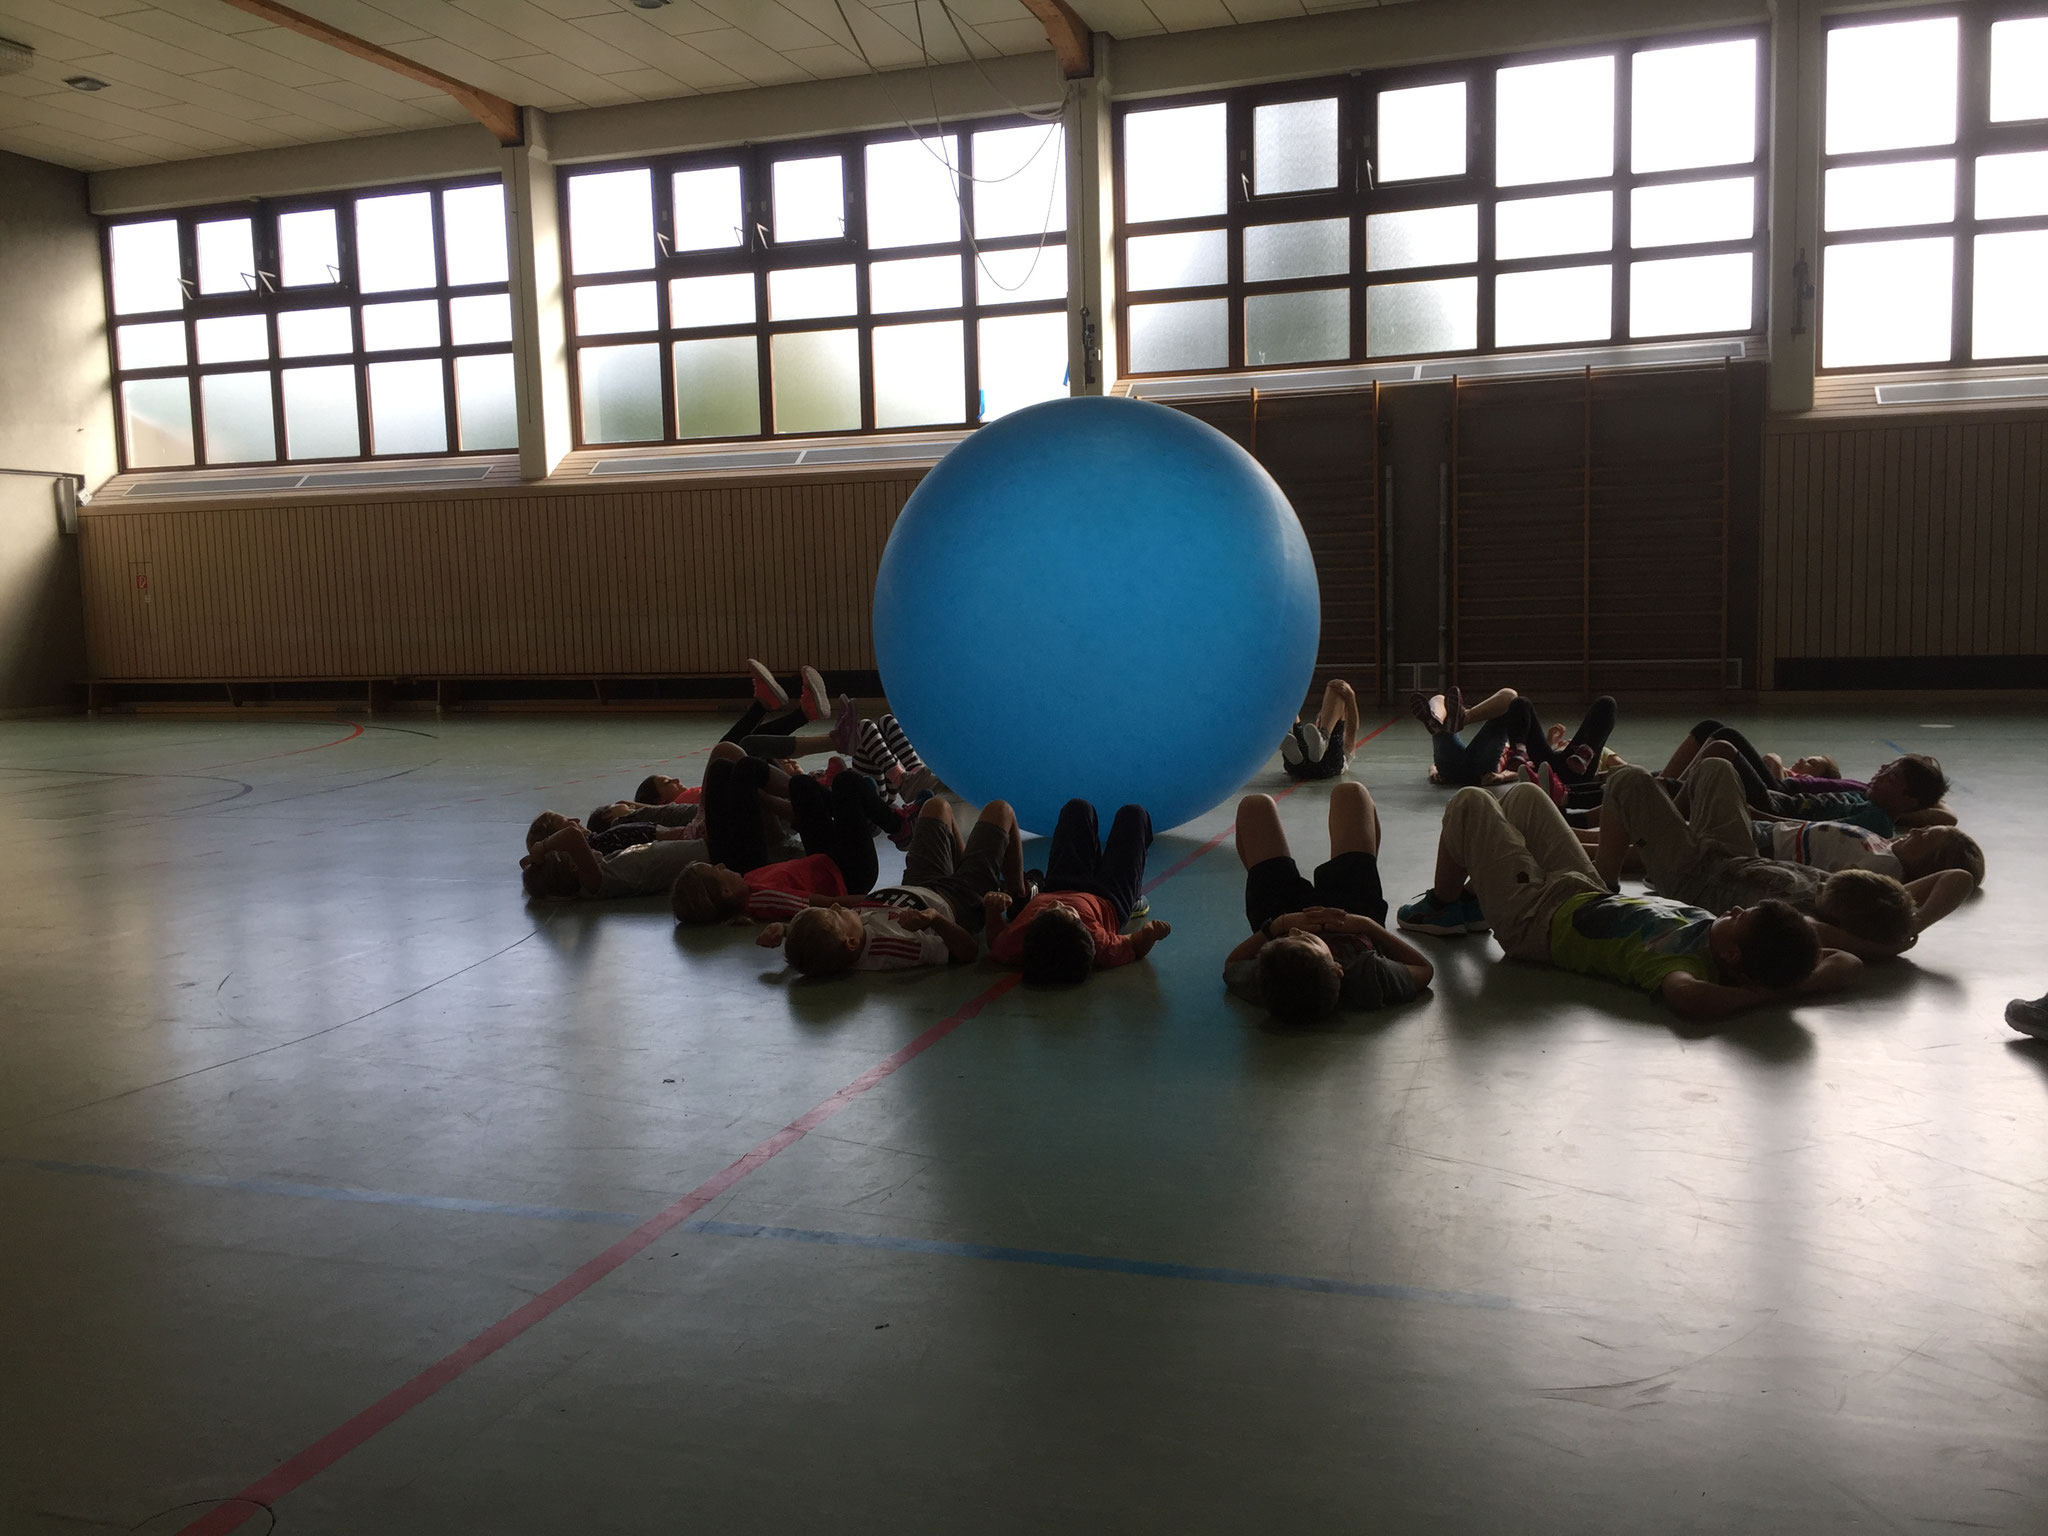 Kooperation war gefragt beim Big Ball